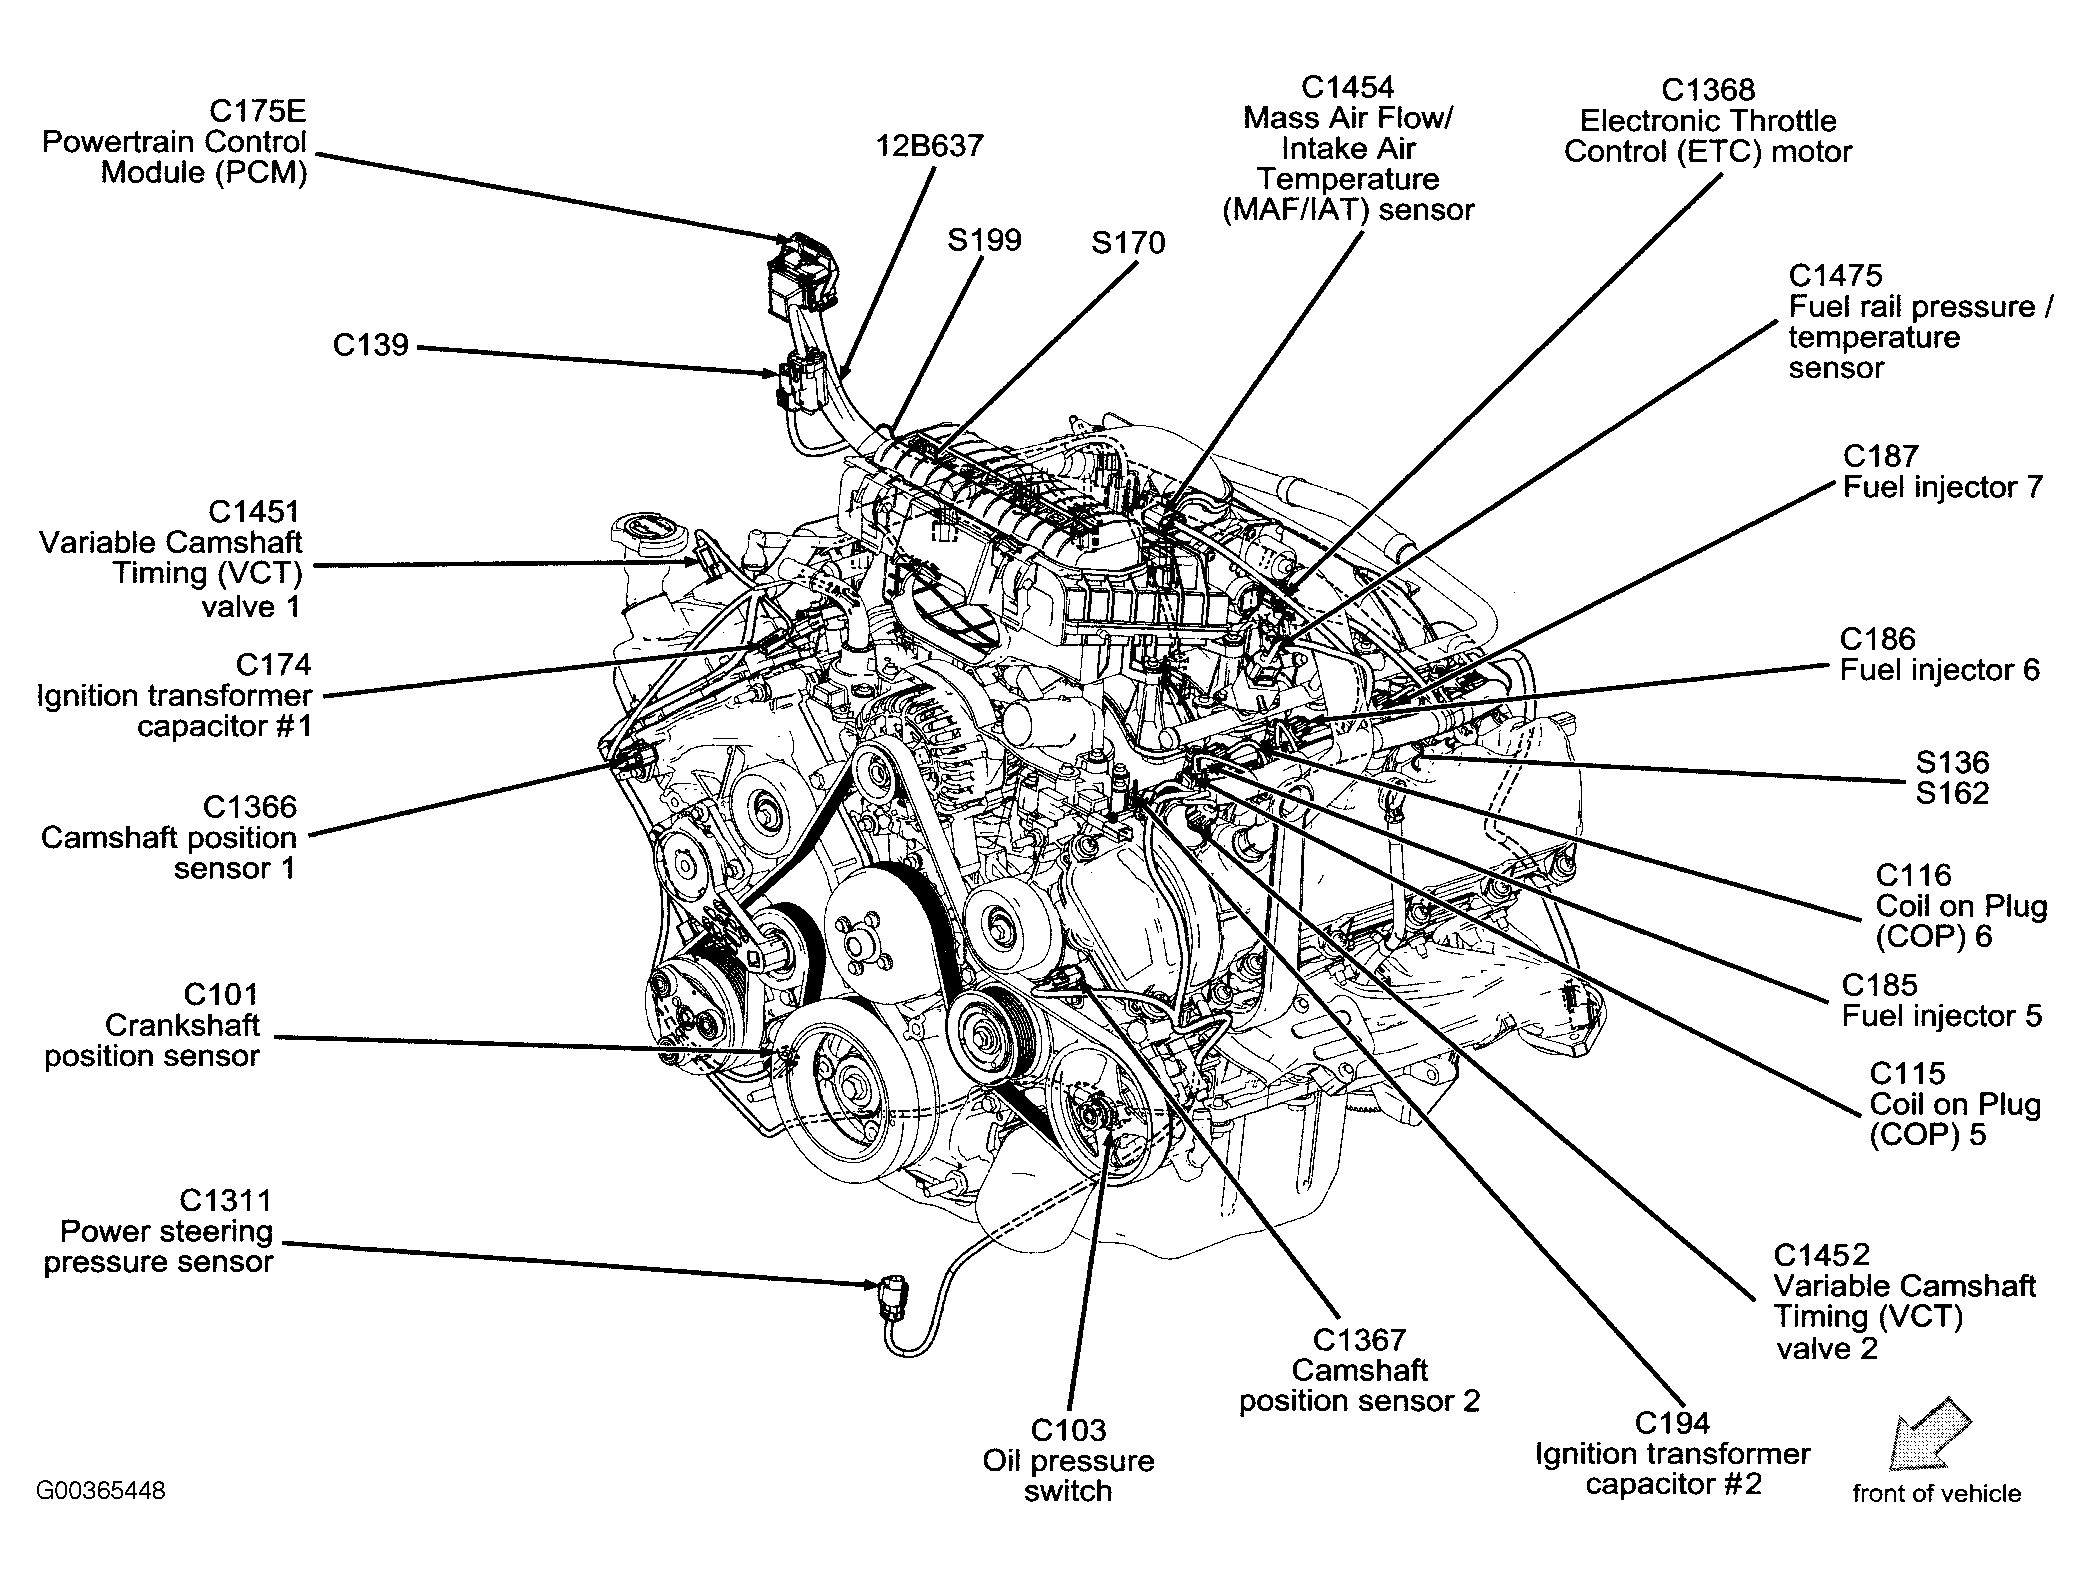 2002 Ford Taurus Engine Diagram - wiring diagram on the net  Taurus Engine Diagram on